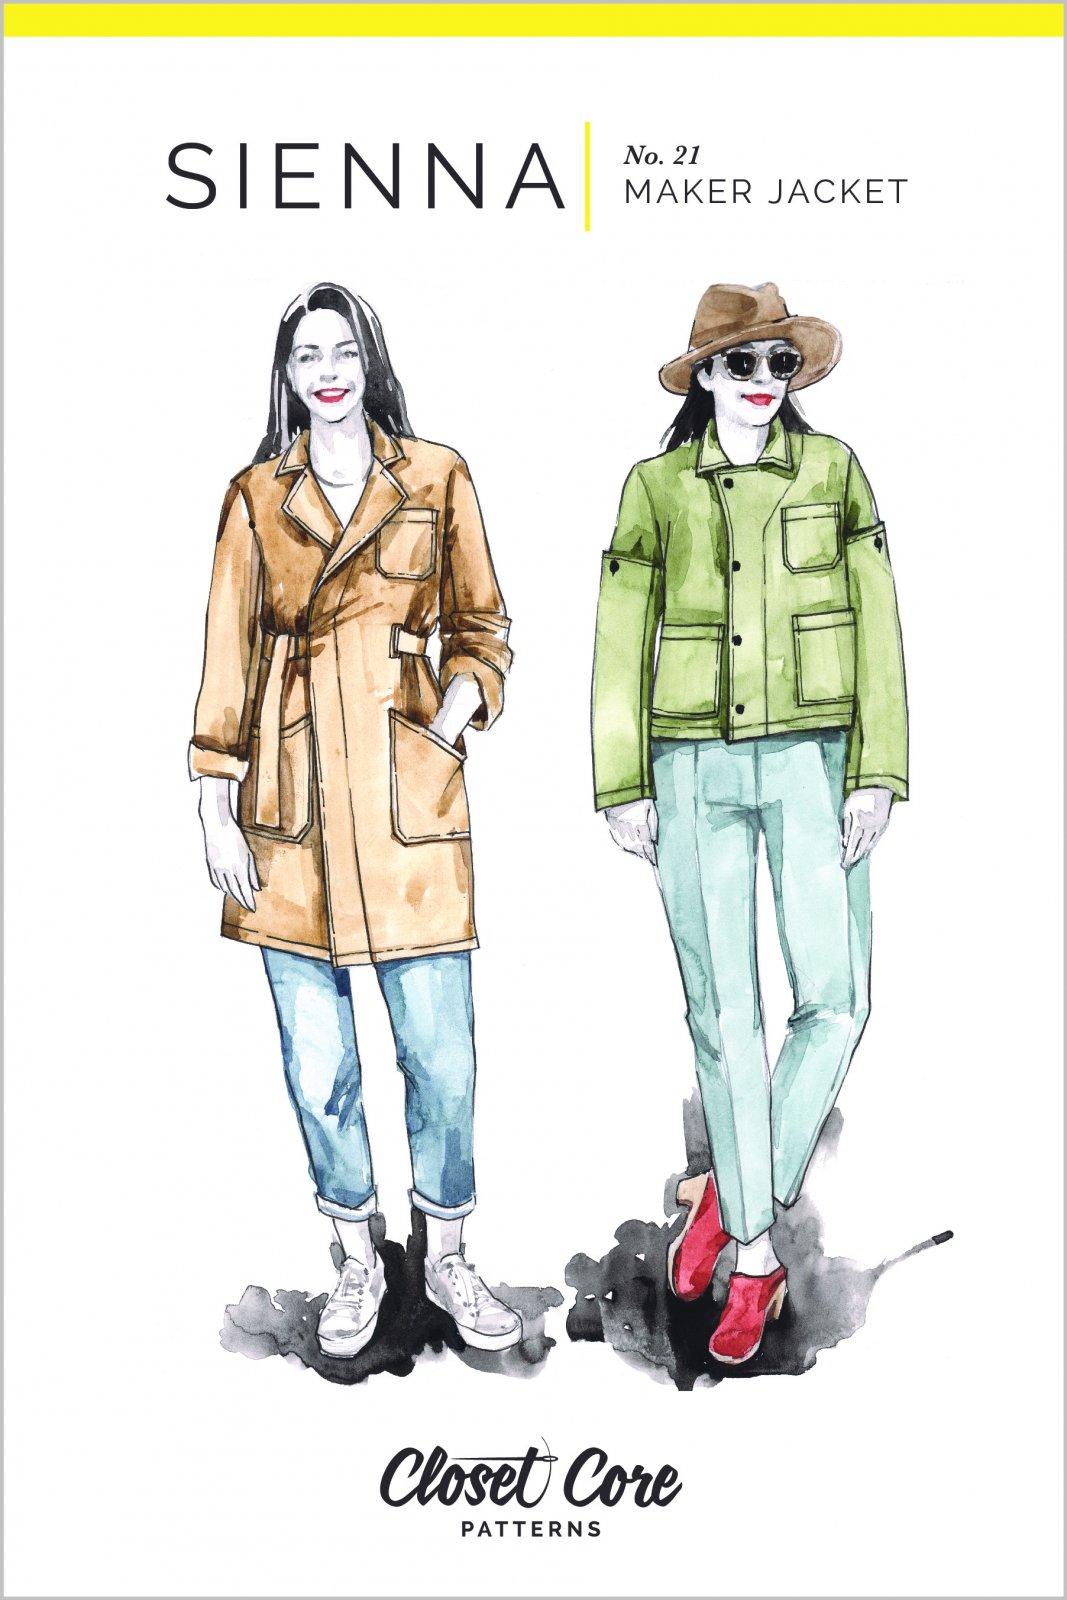 Sienna Maker Jacket - Closet Core Patterns